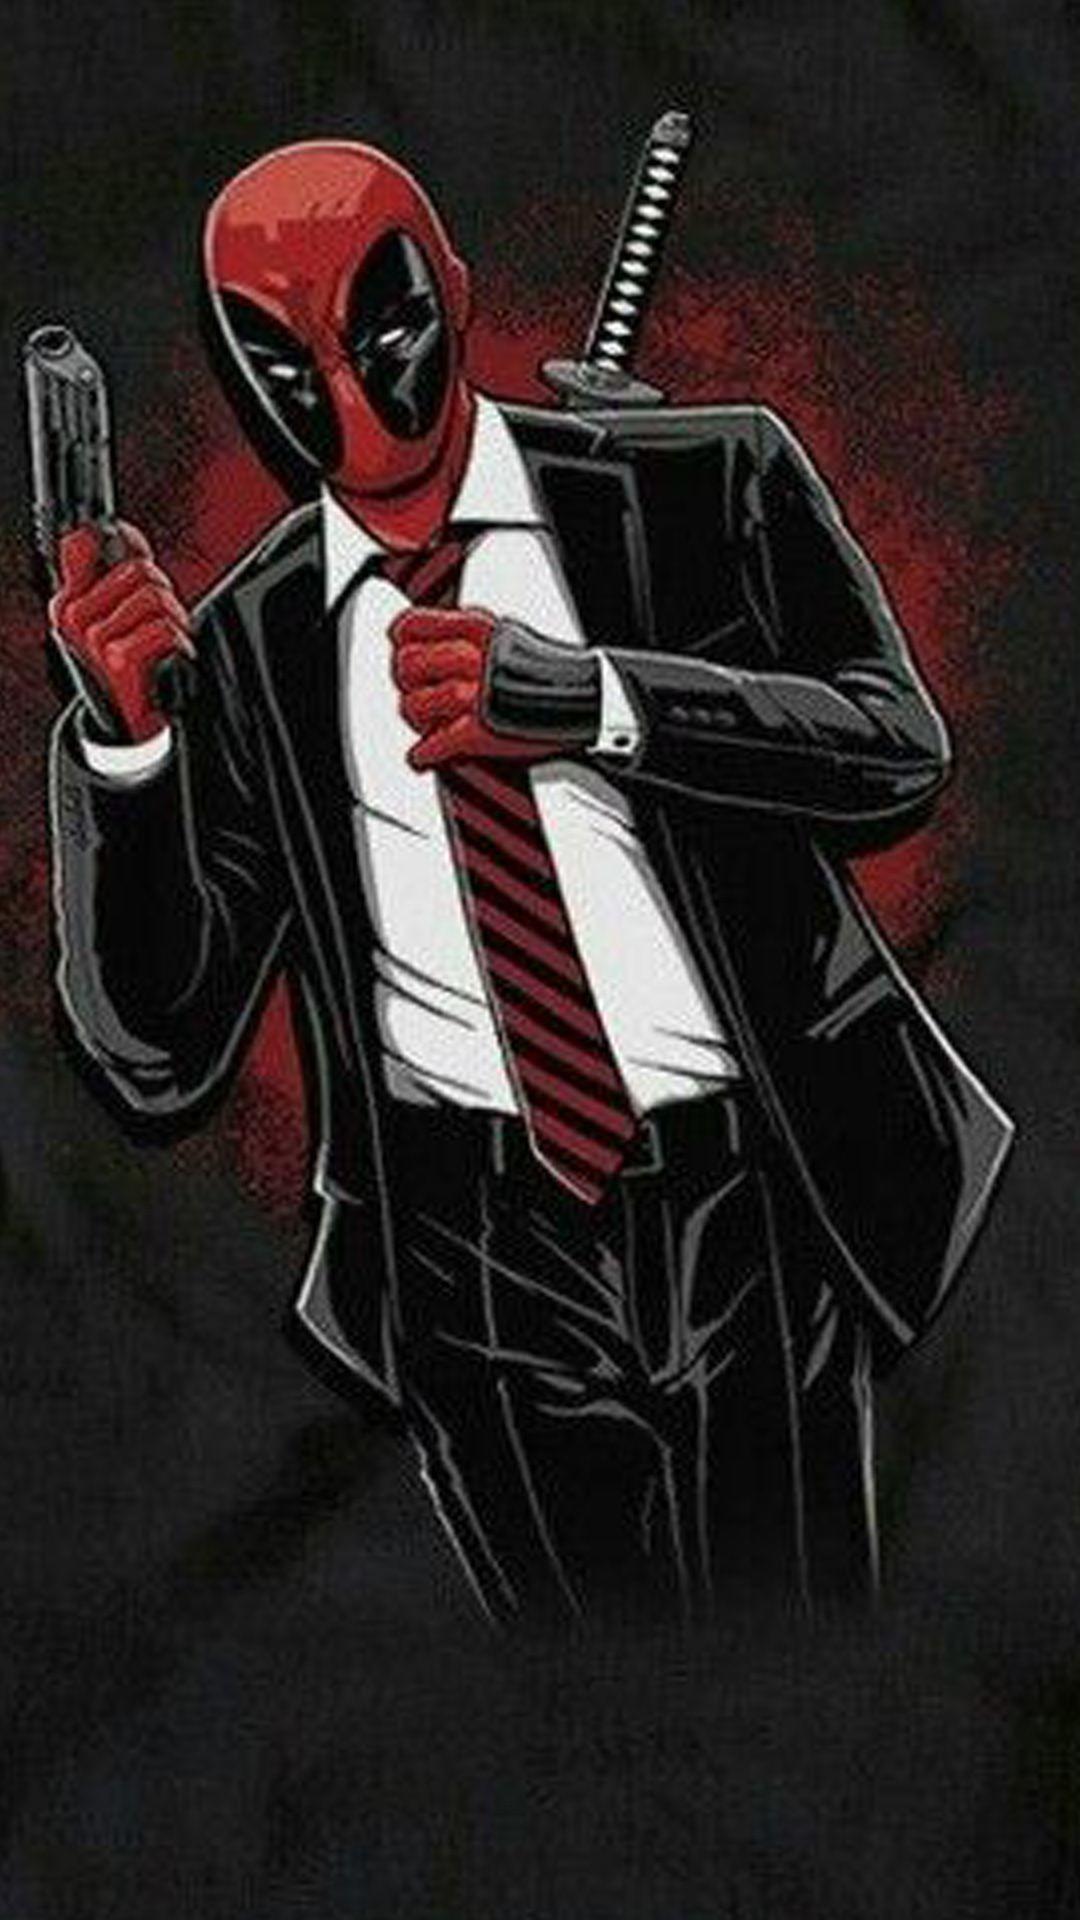 Deadpool Hd 4k Iphone Wallpapers Wallpaper Cave